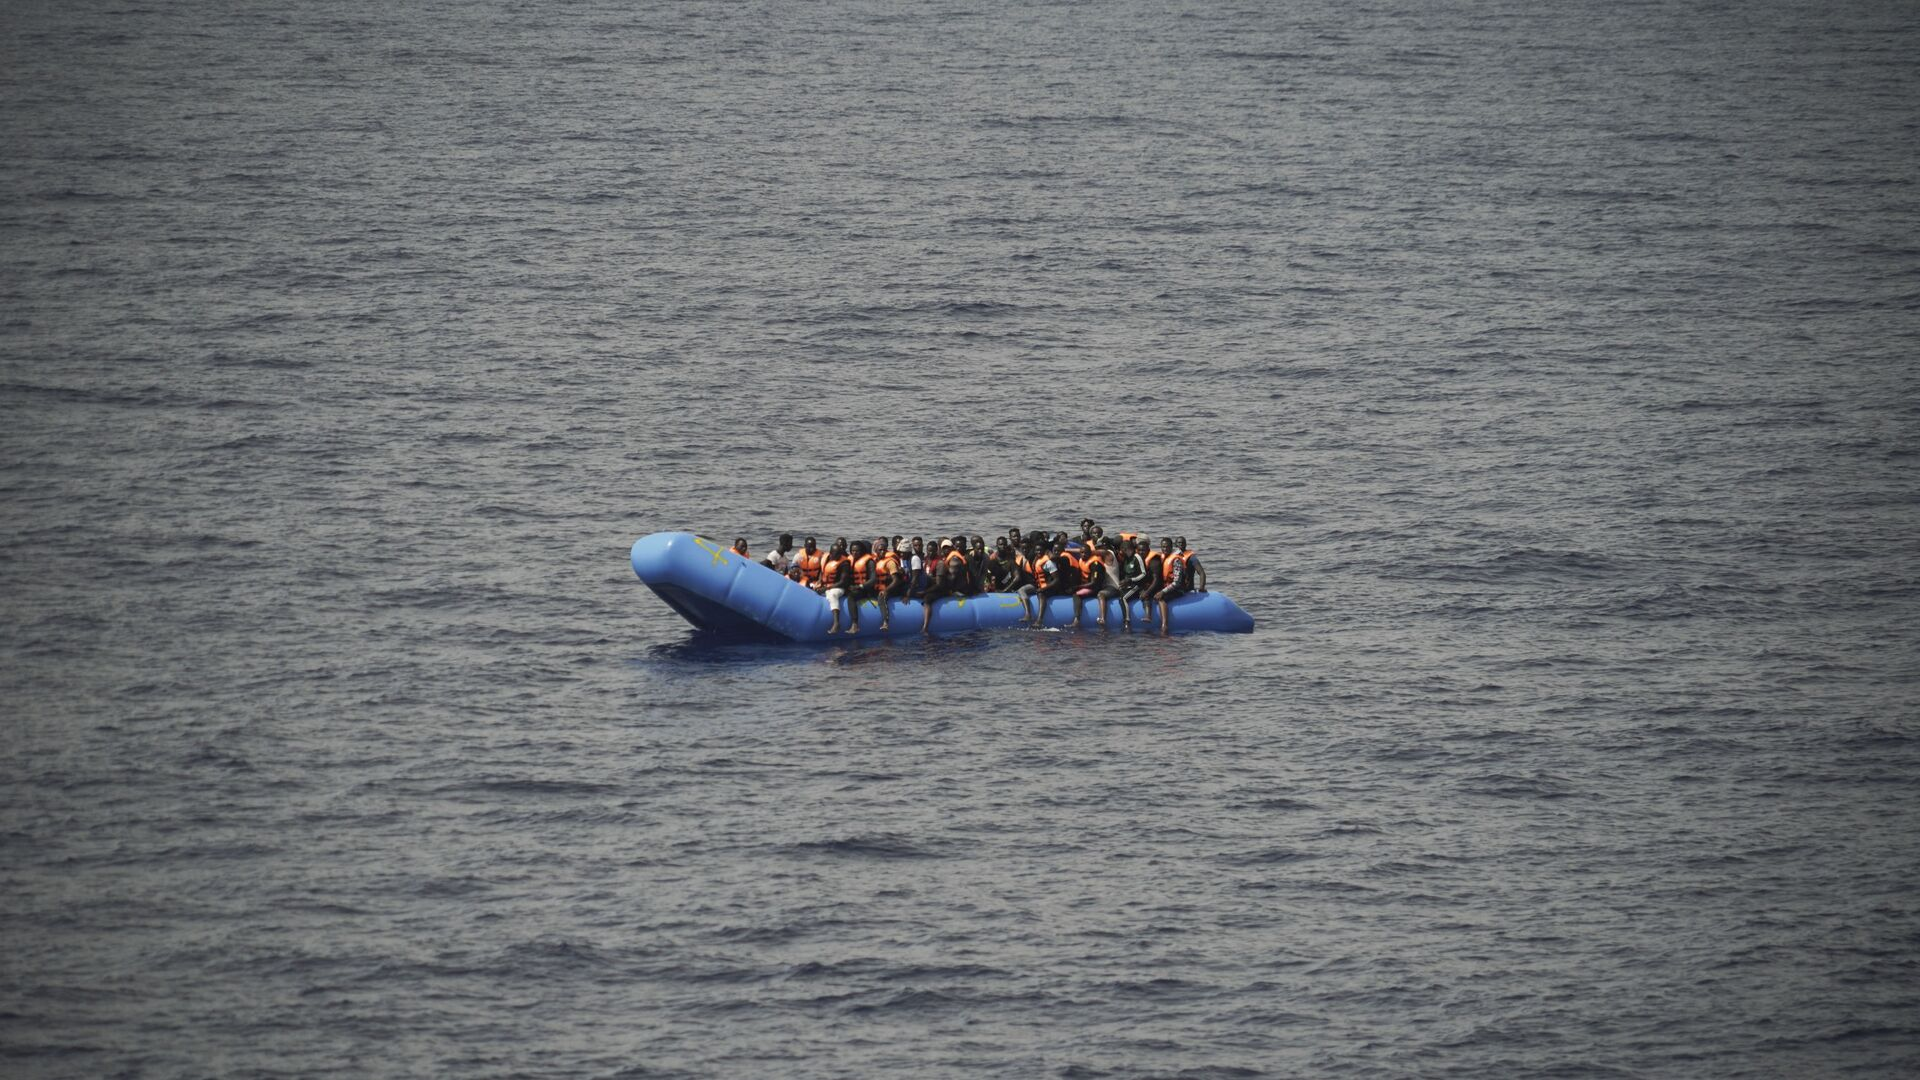 Migranti su una barca - Sputnik Italia, 1920, 01.09.2021